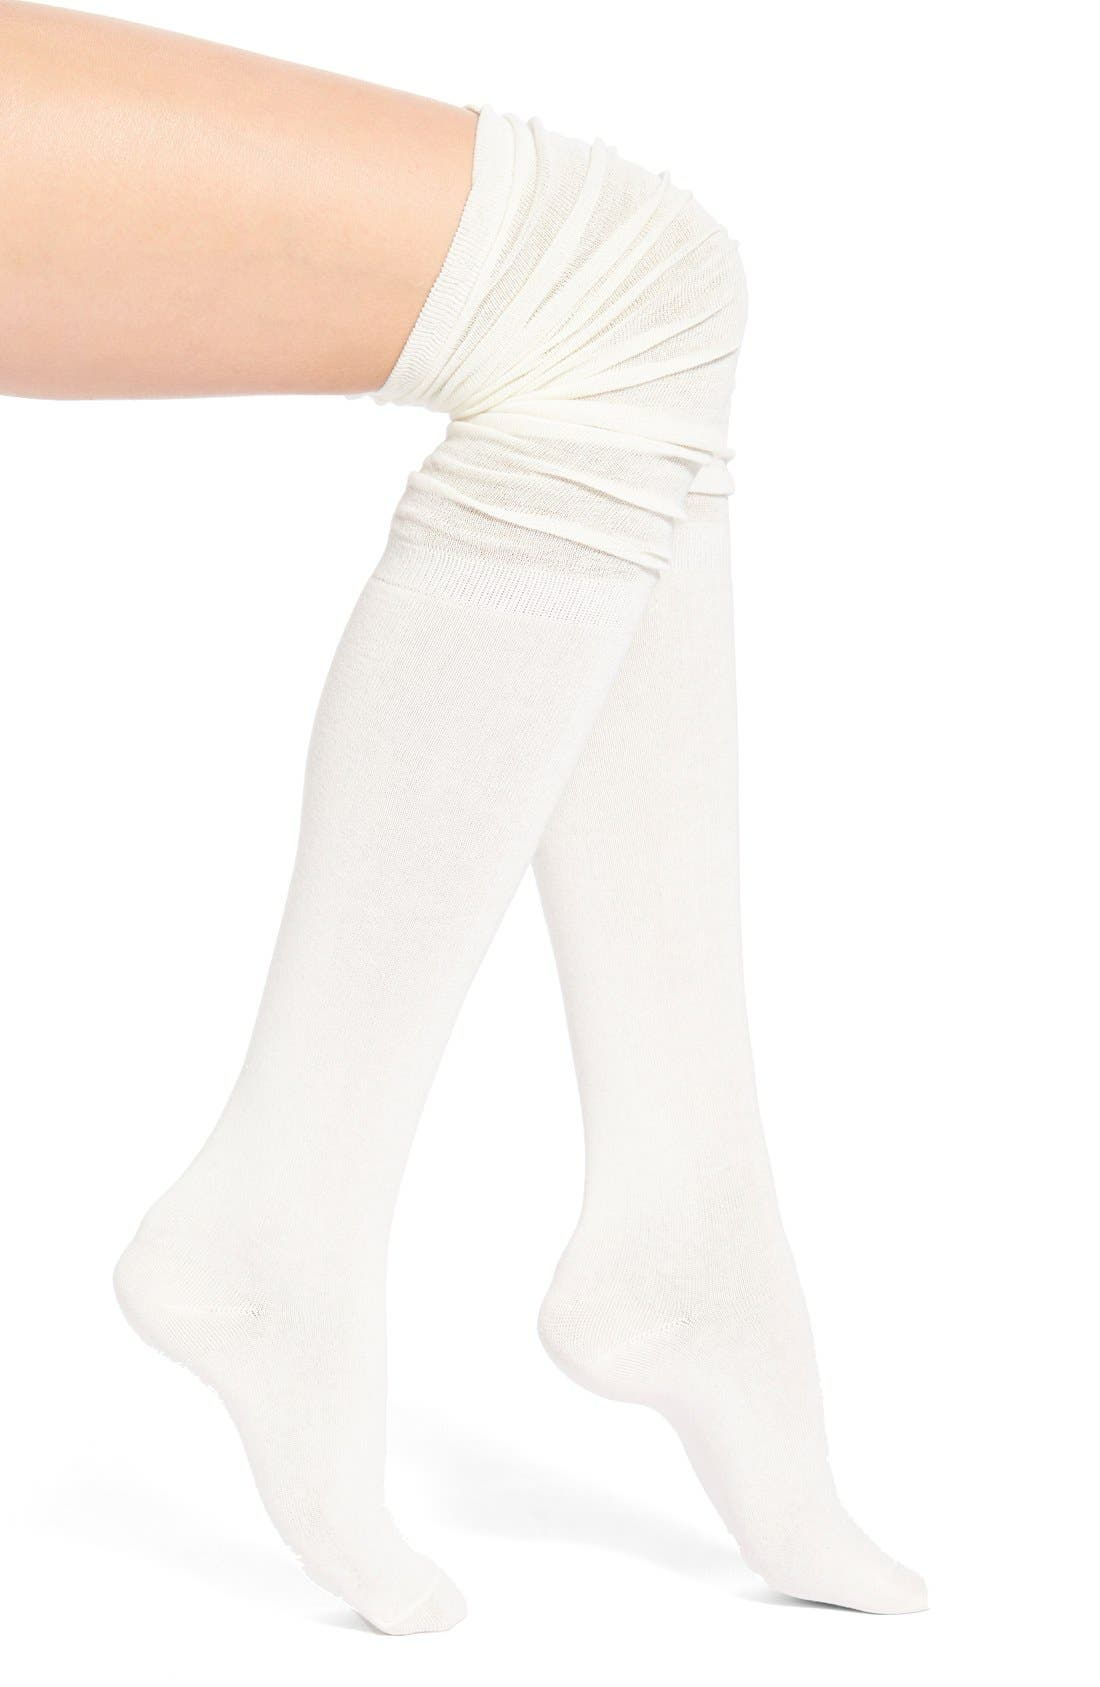 Main Image - Arthur George by R. Kardashian Slouchy Over the Knee Socks